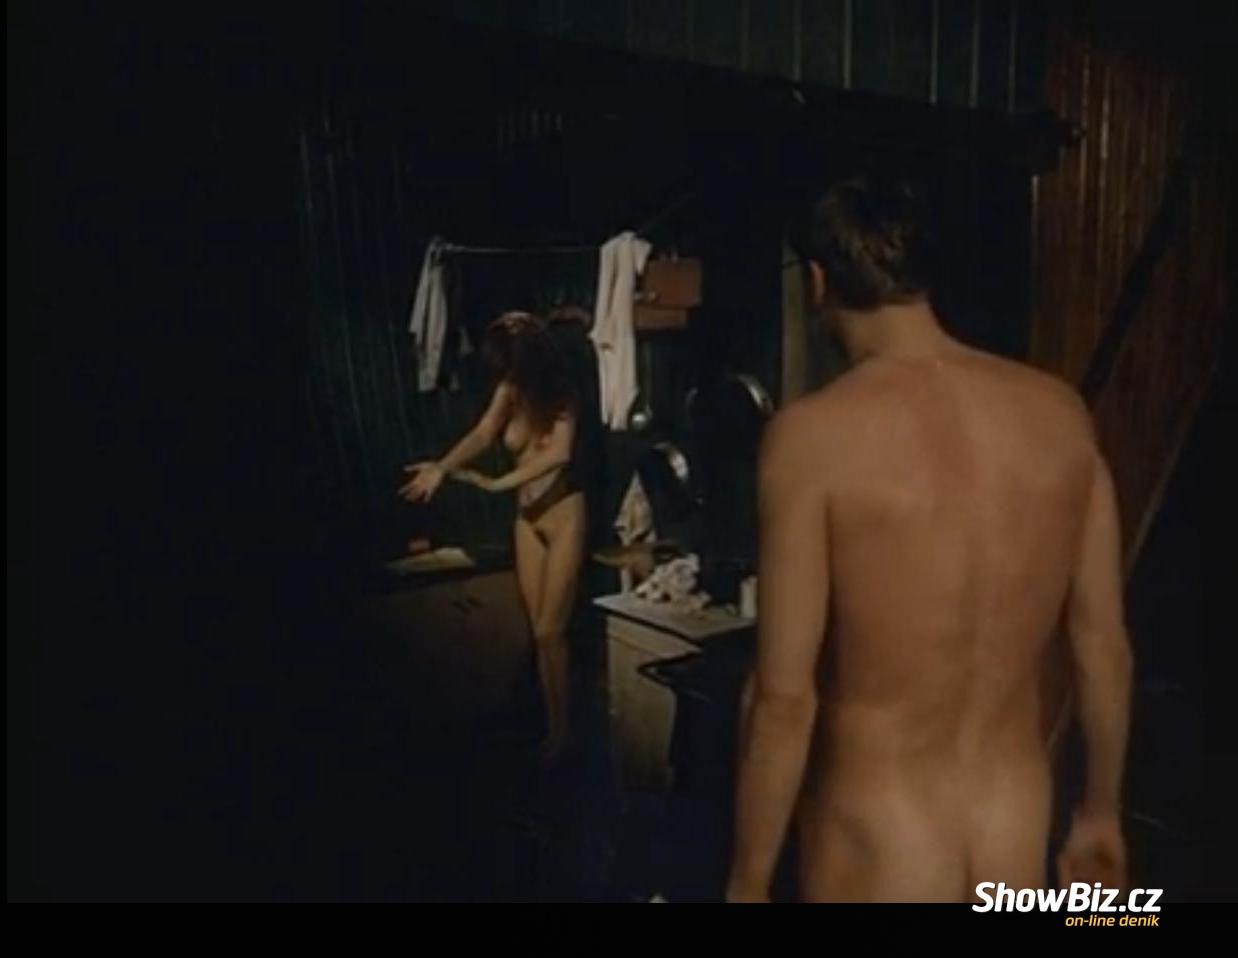 porn cz markéta hrubešová